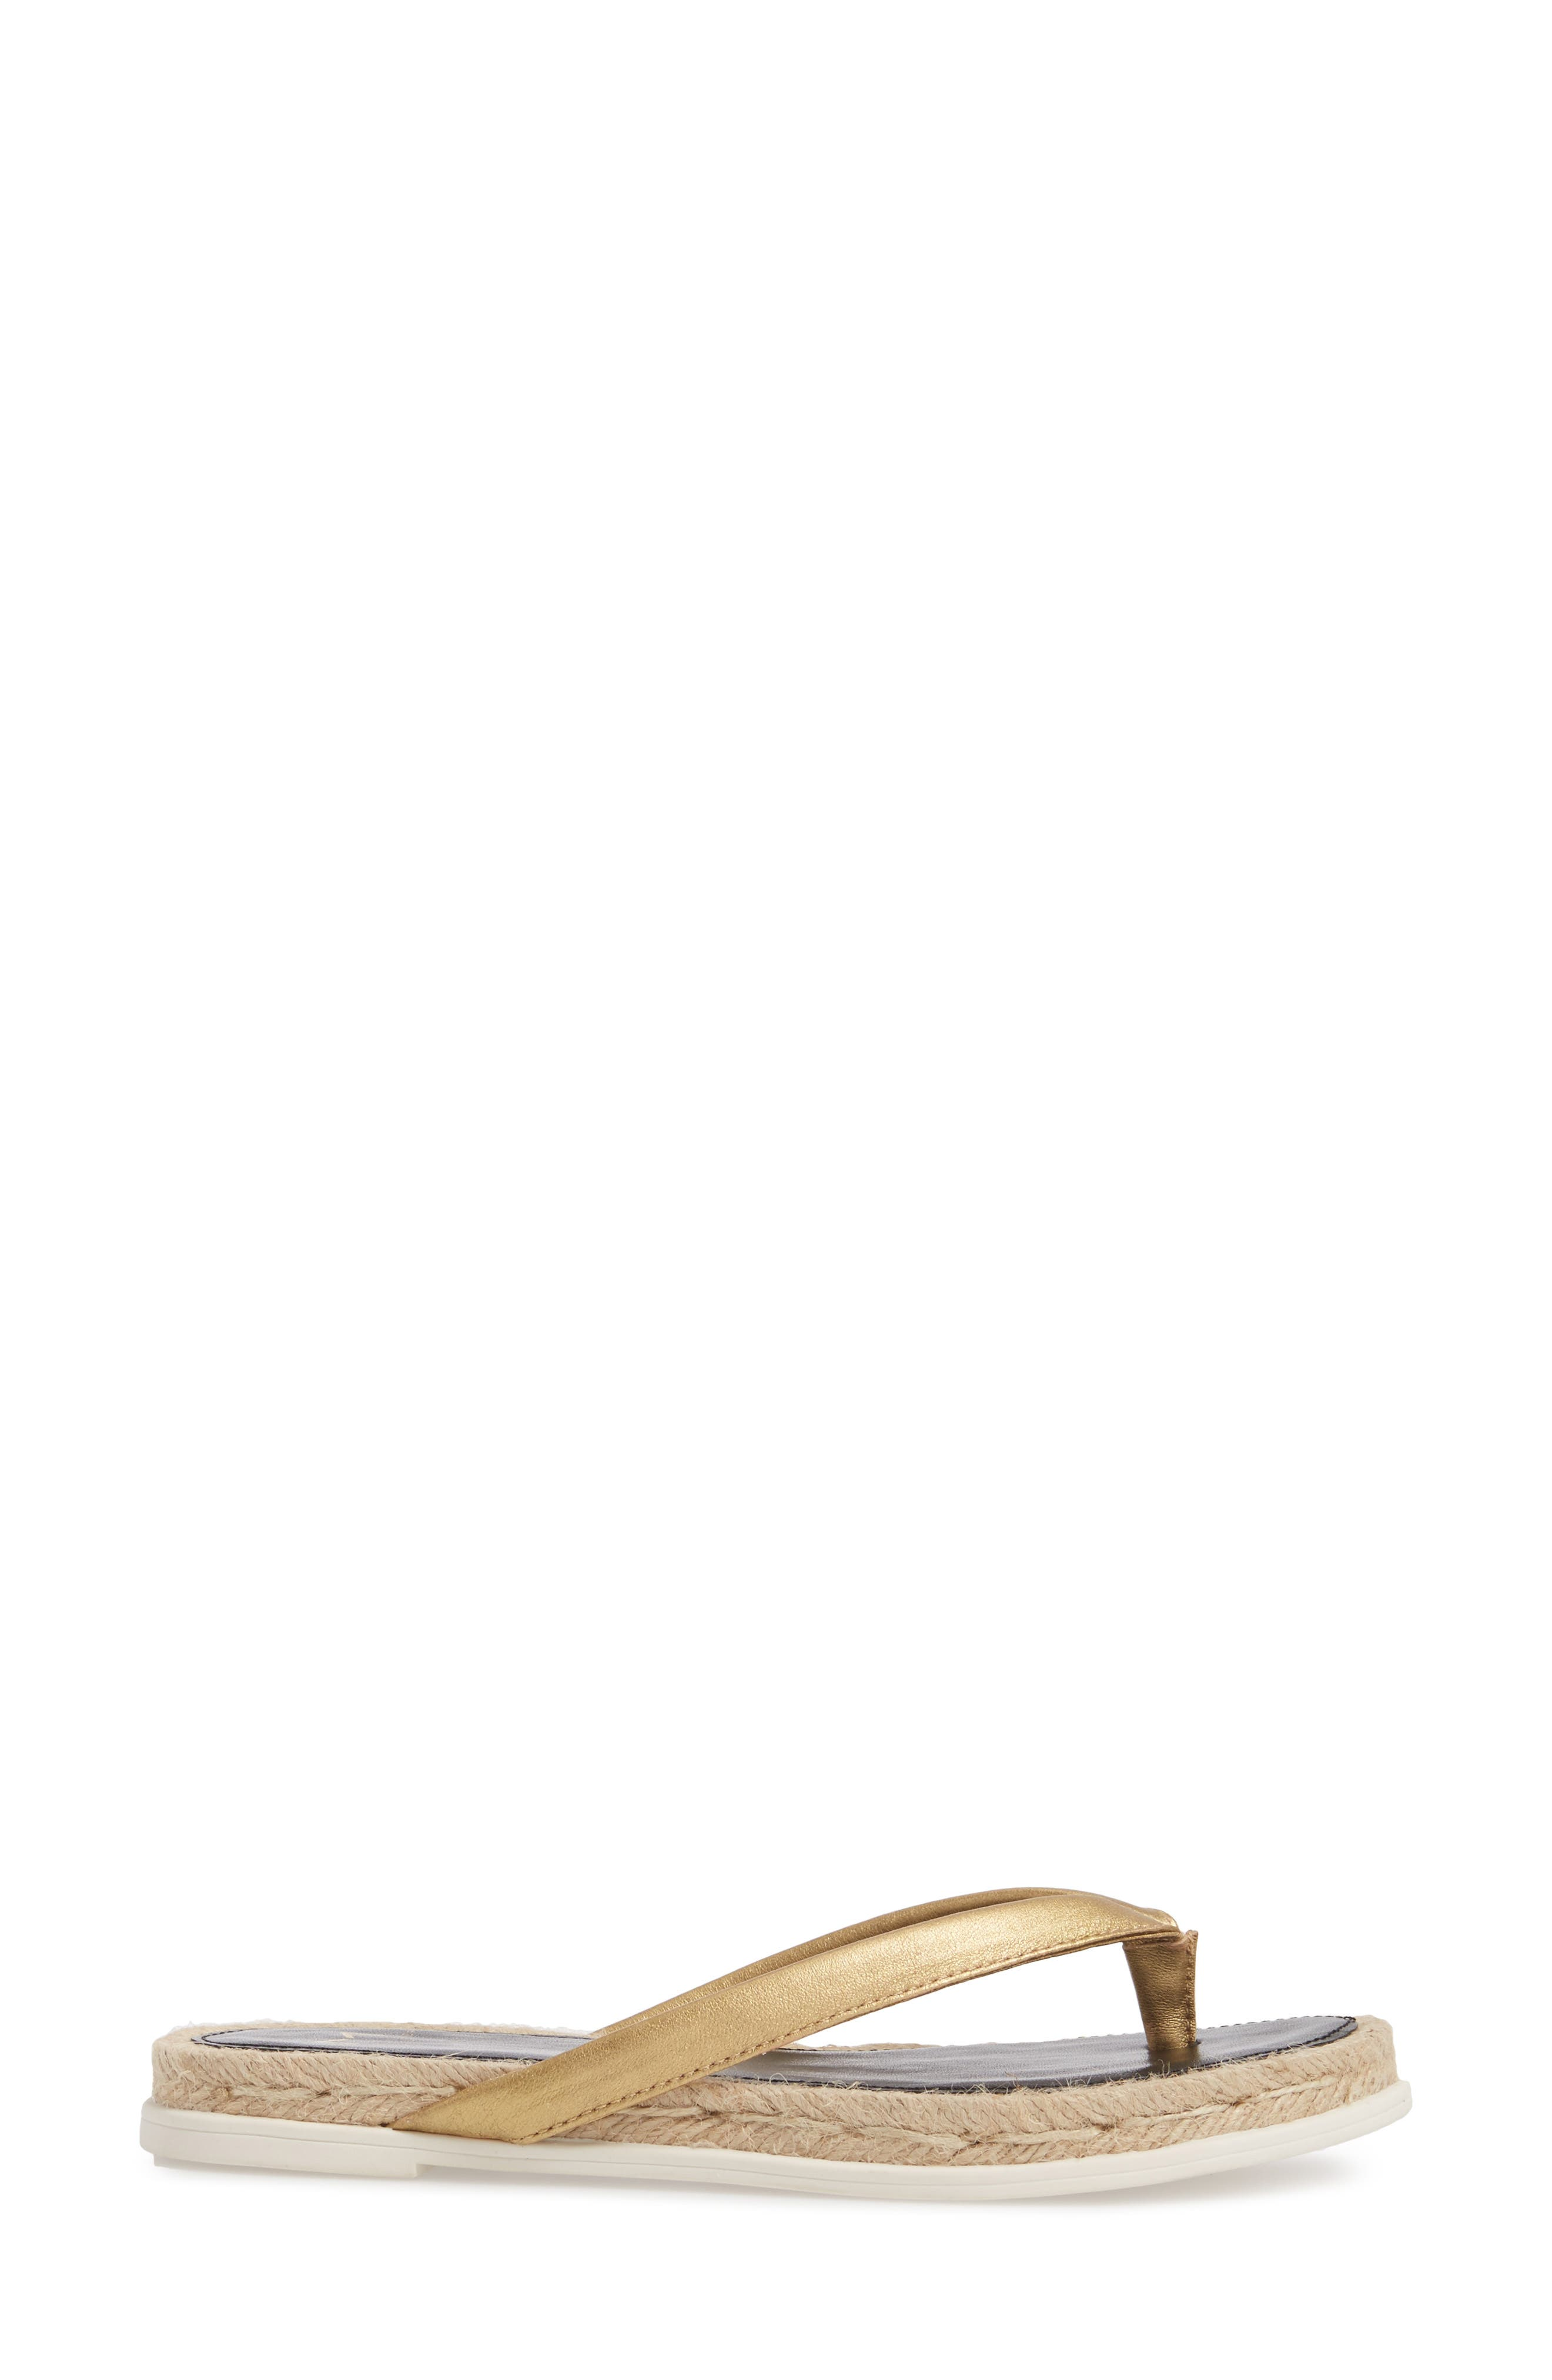 Utah Espadrille Sandal,                             Alternate thumbnail 9, color,